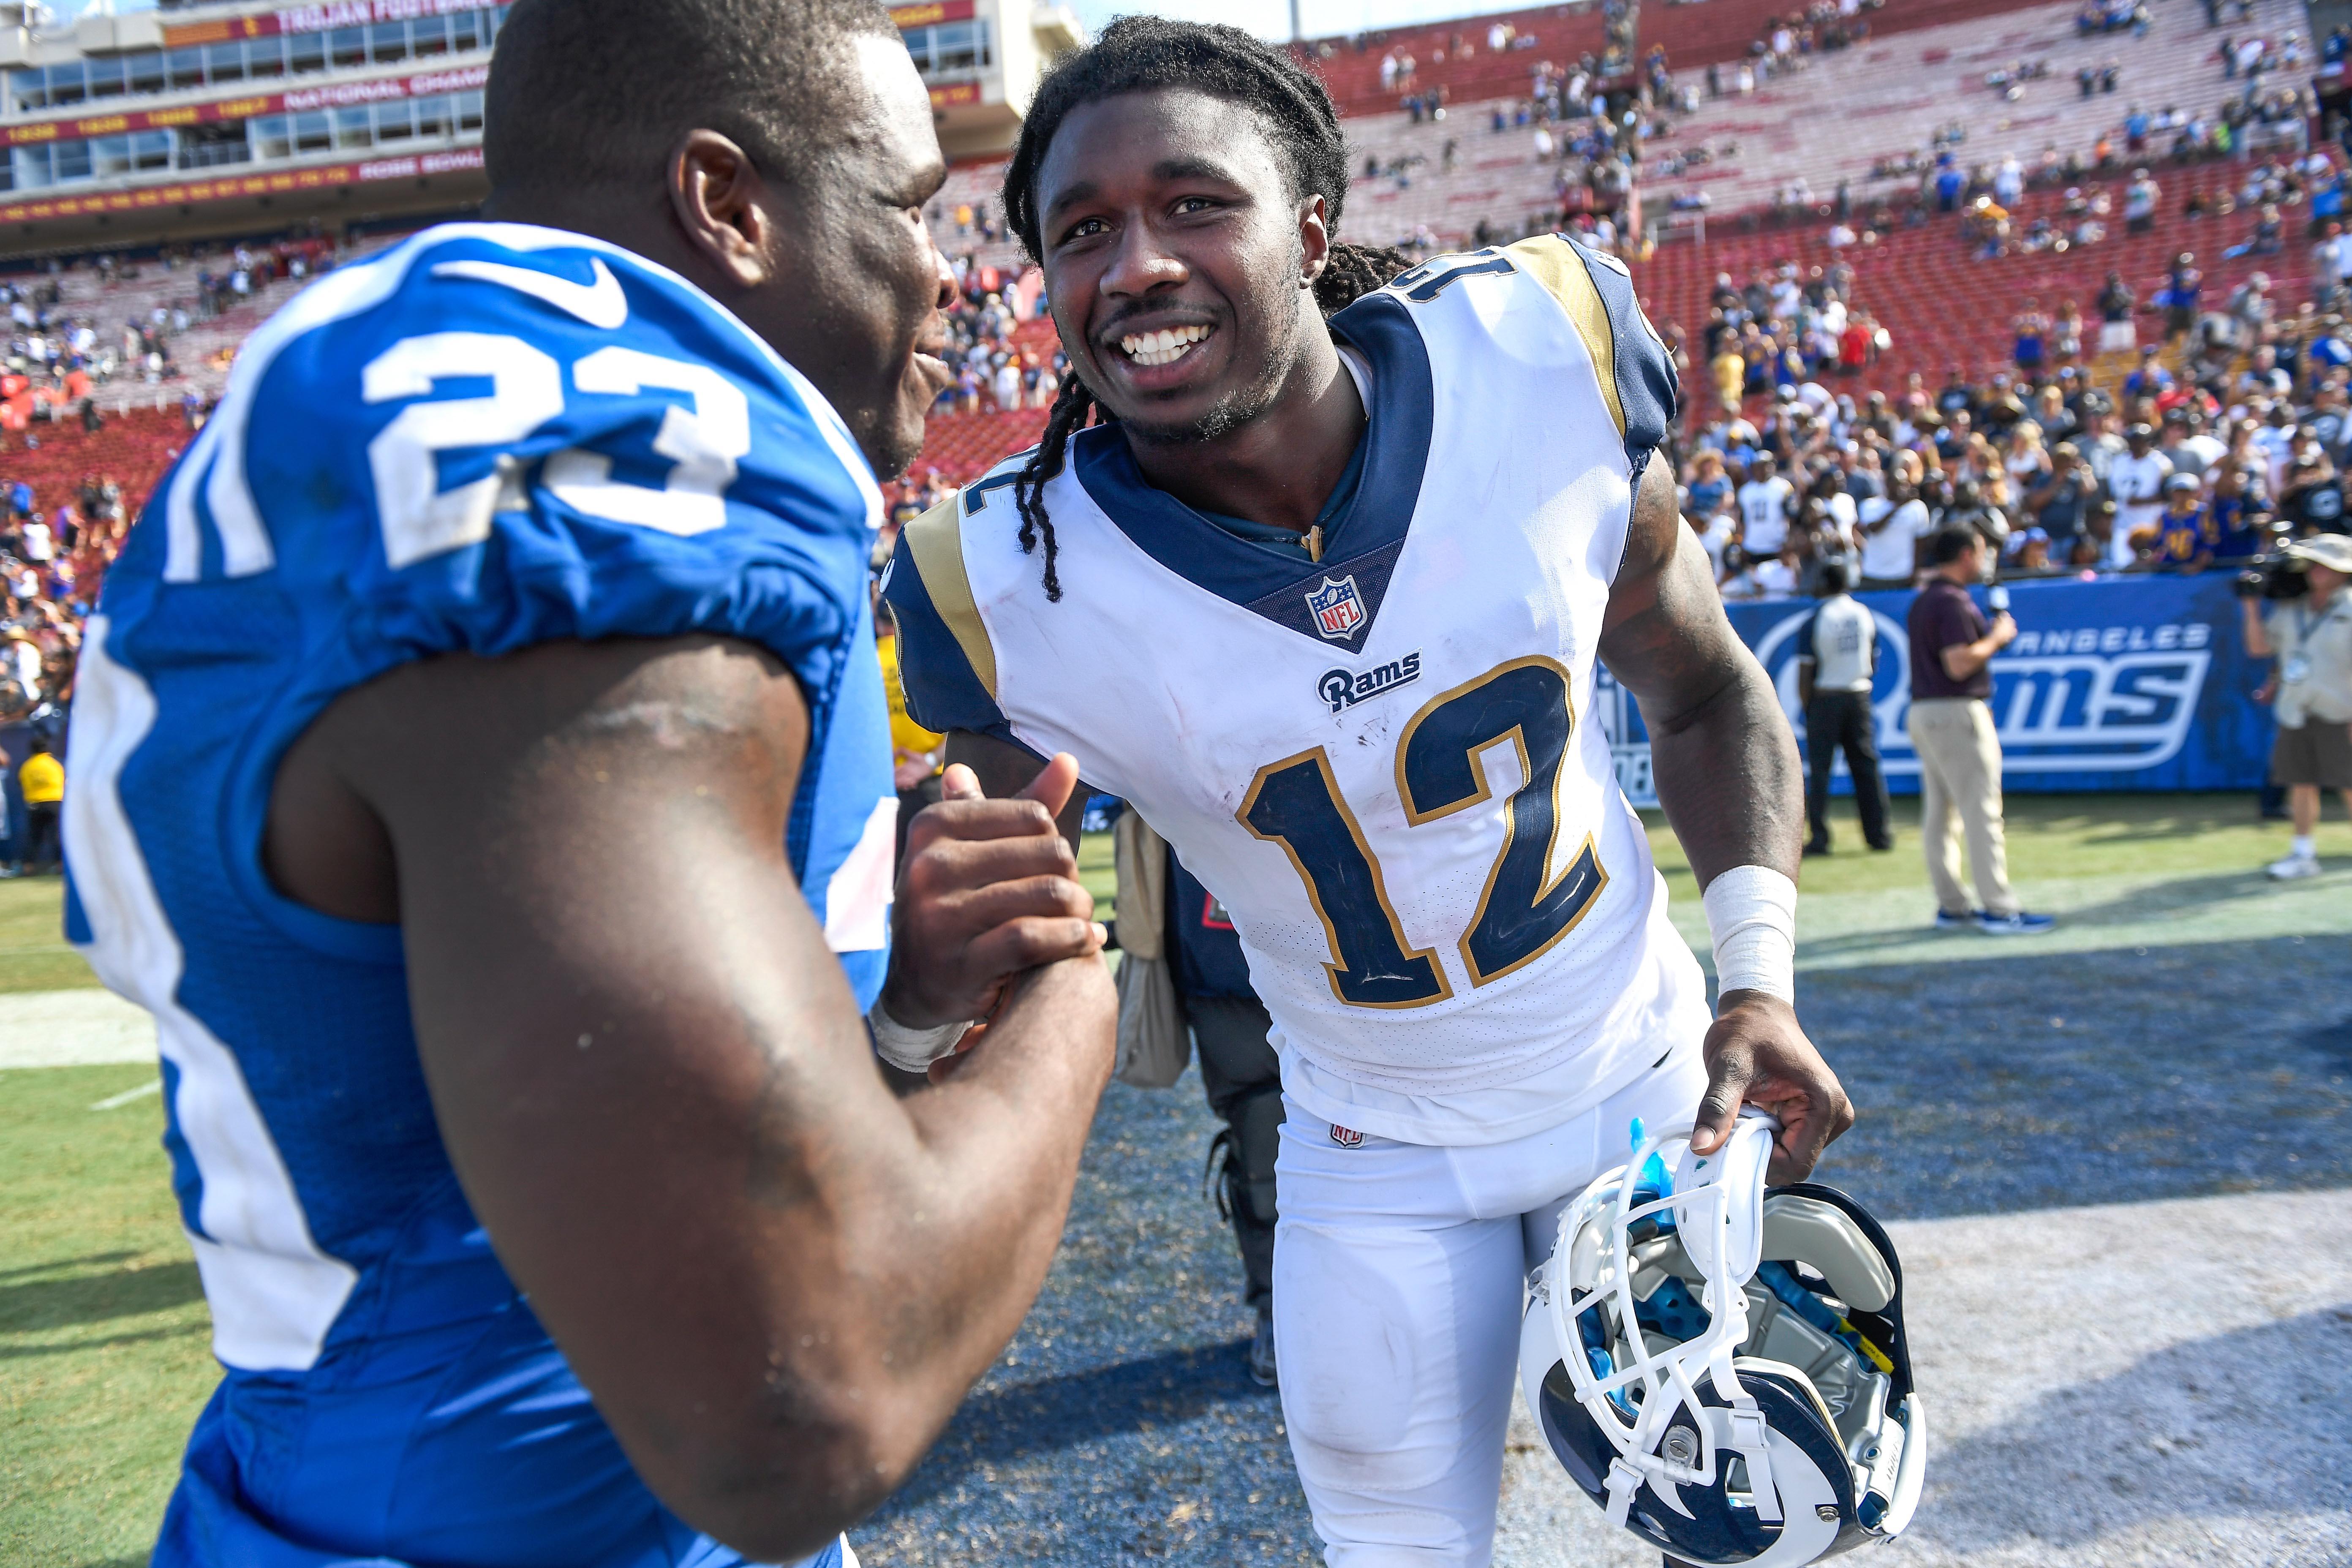 NFL: Indianapolis Colts at Los Angeles Rams